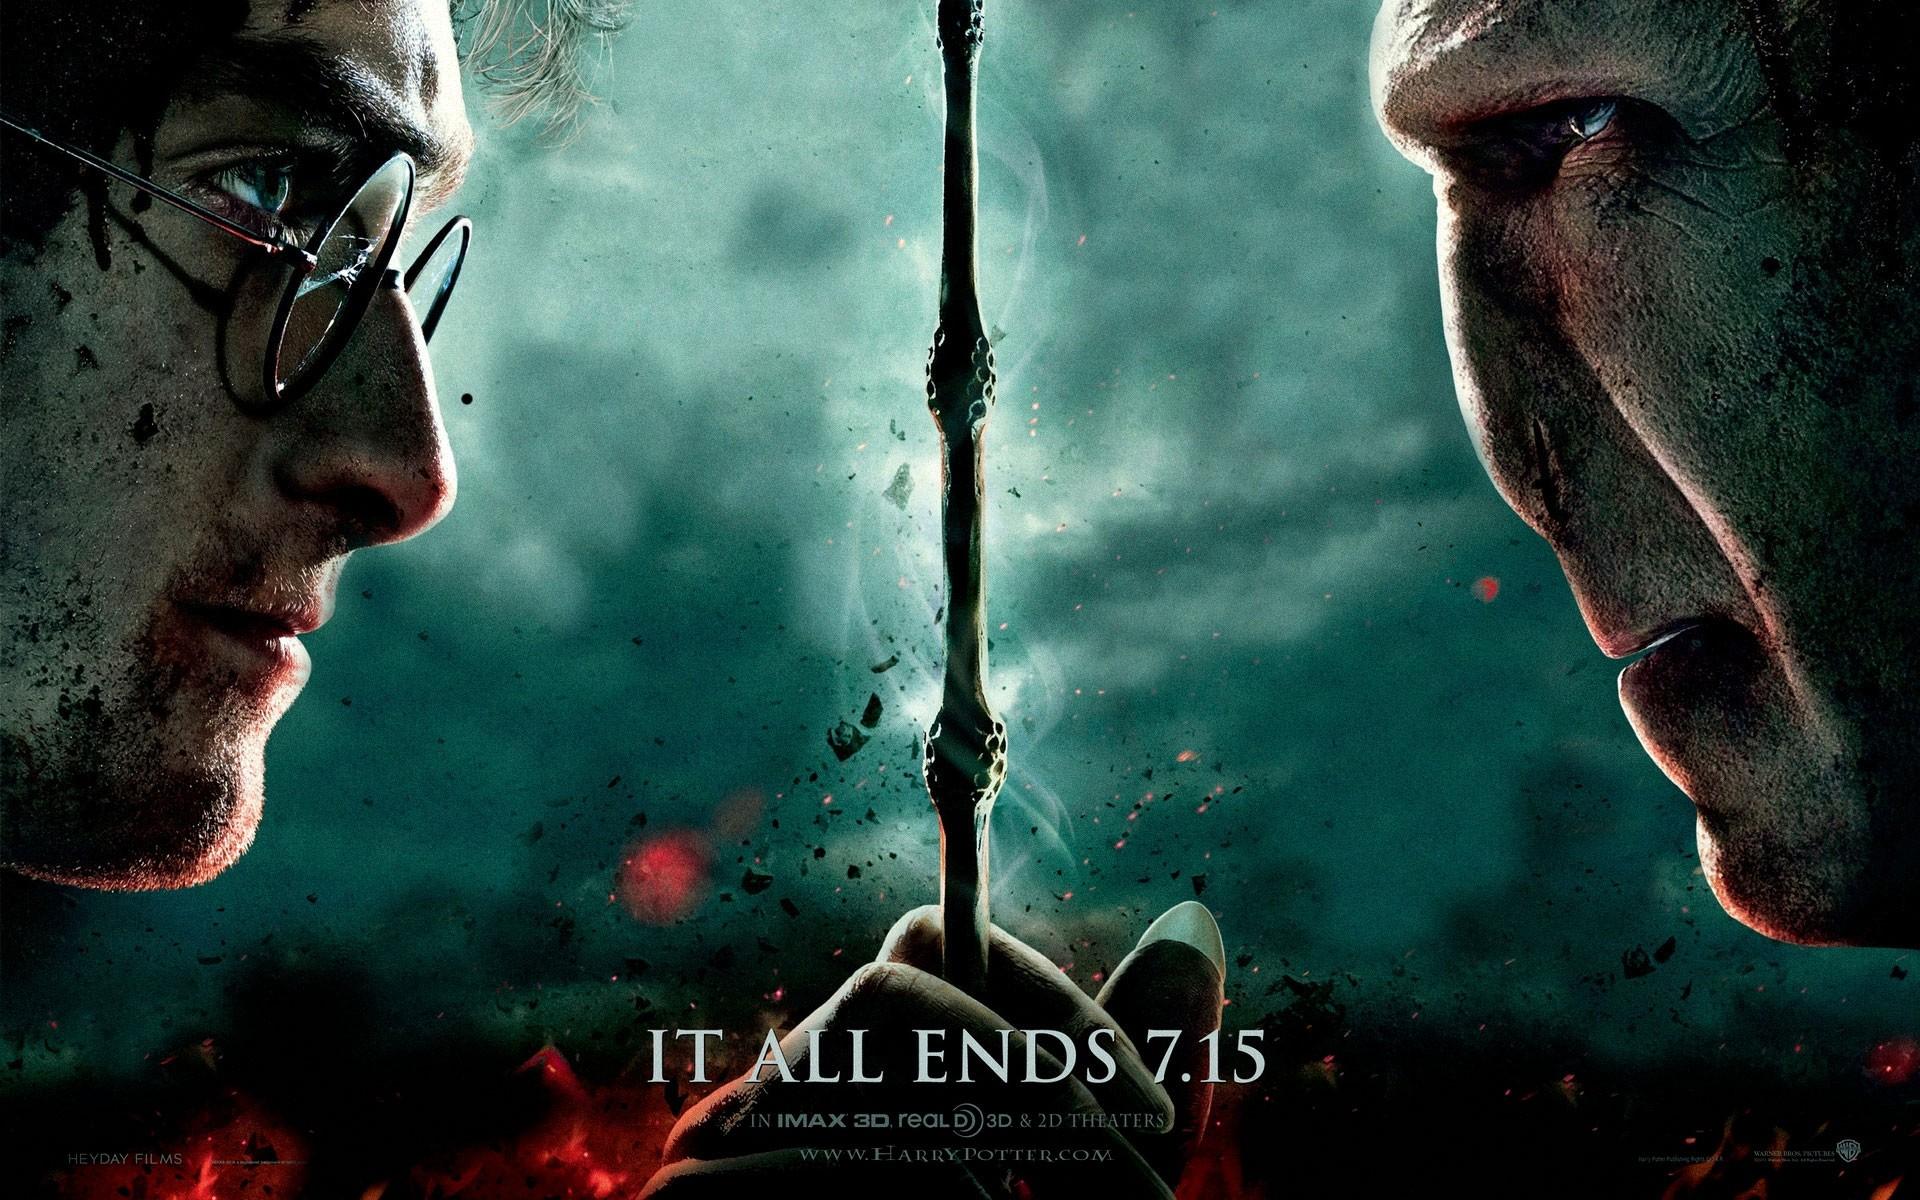 Harry Potter 7 Part 2 Movies Wallpapers, Desktop Backgrounds